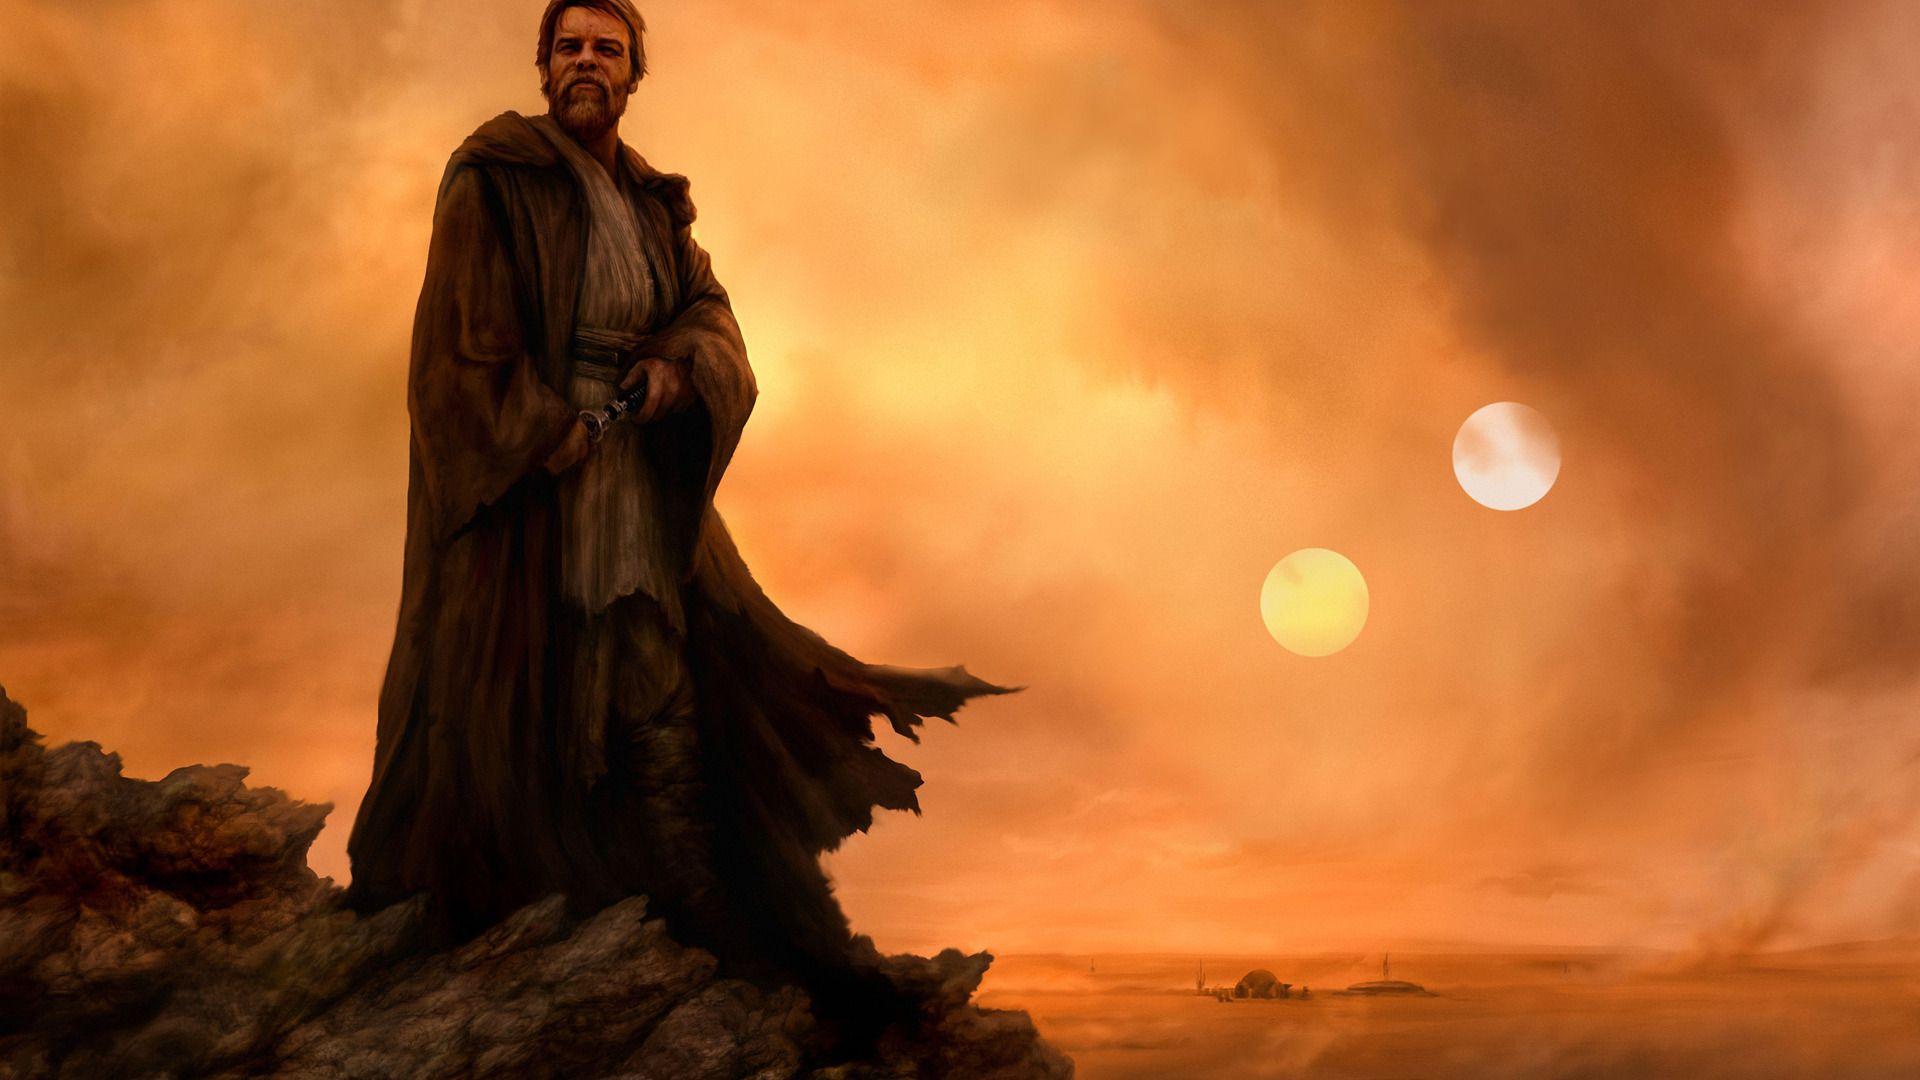 Obi Wan In Exile A Silent Guardian On A Dusty Planet 1920x1080 Followme Cooliphone6case On Twitter Facebook Star Wars Wallpaper Obi Wan Obi Wan Kenobi